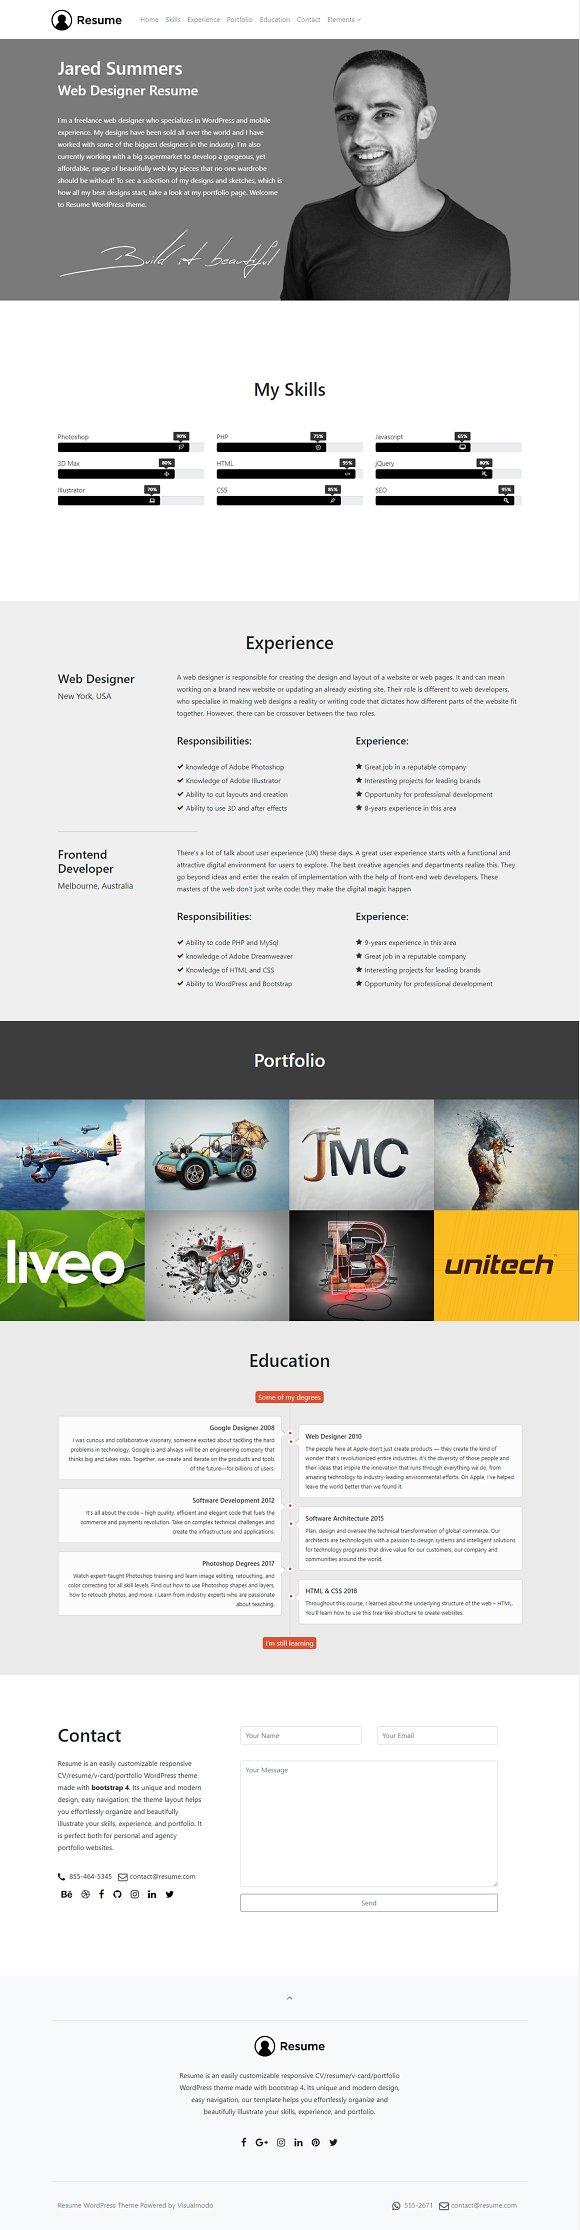 resume wordpress theme wordpress business themes creative market